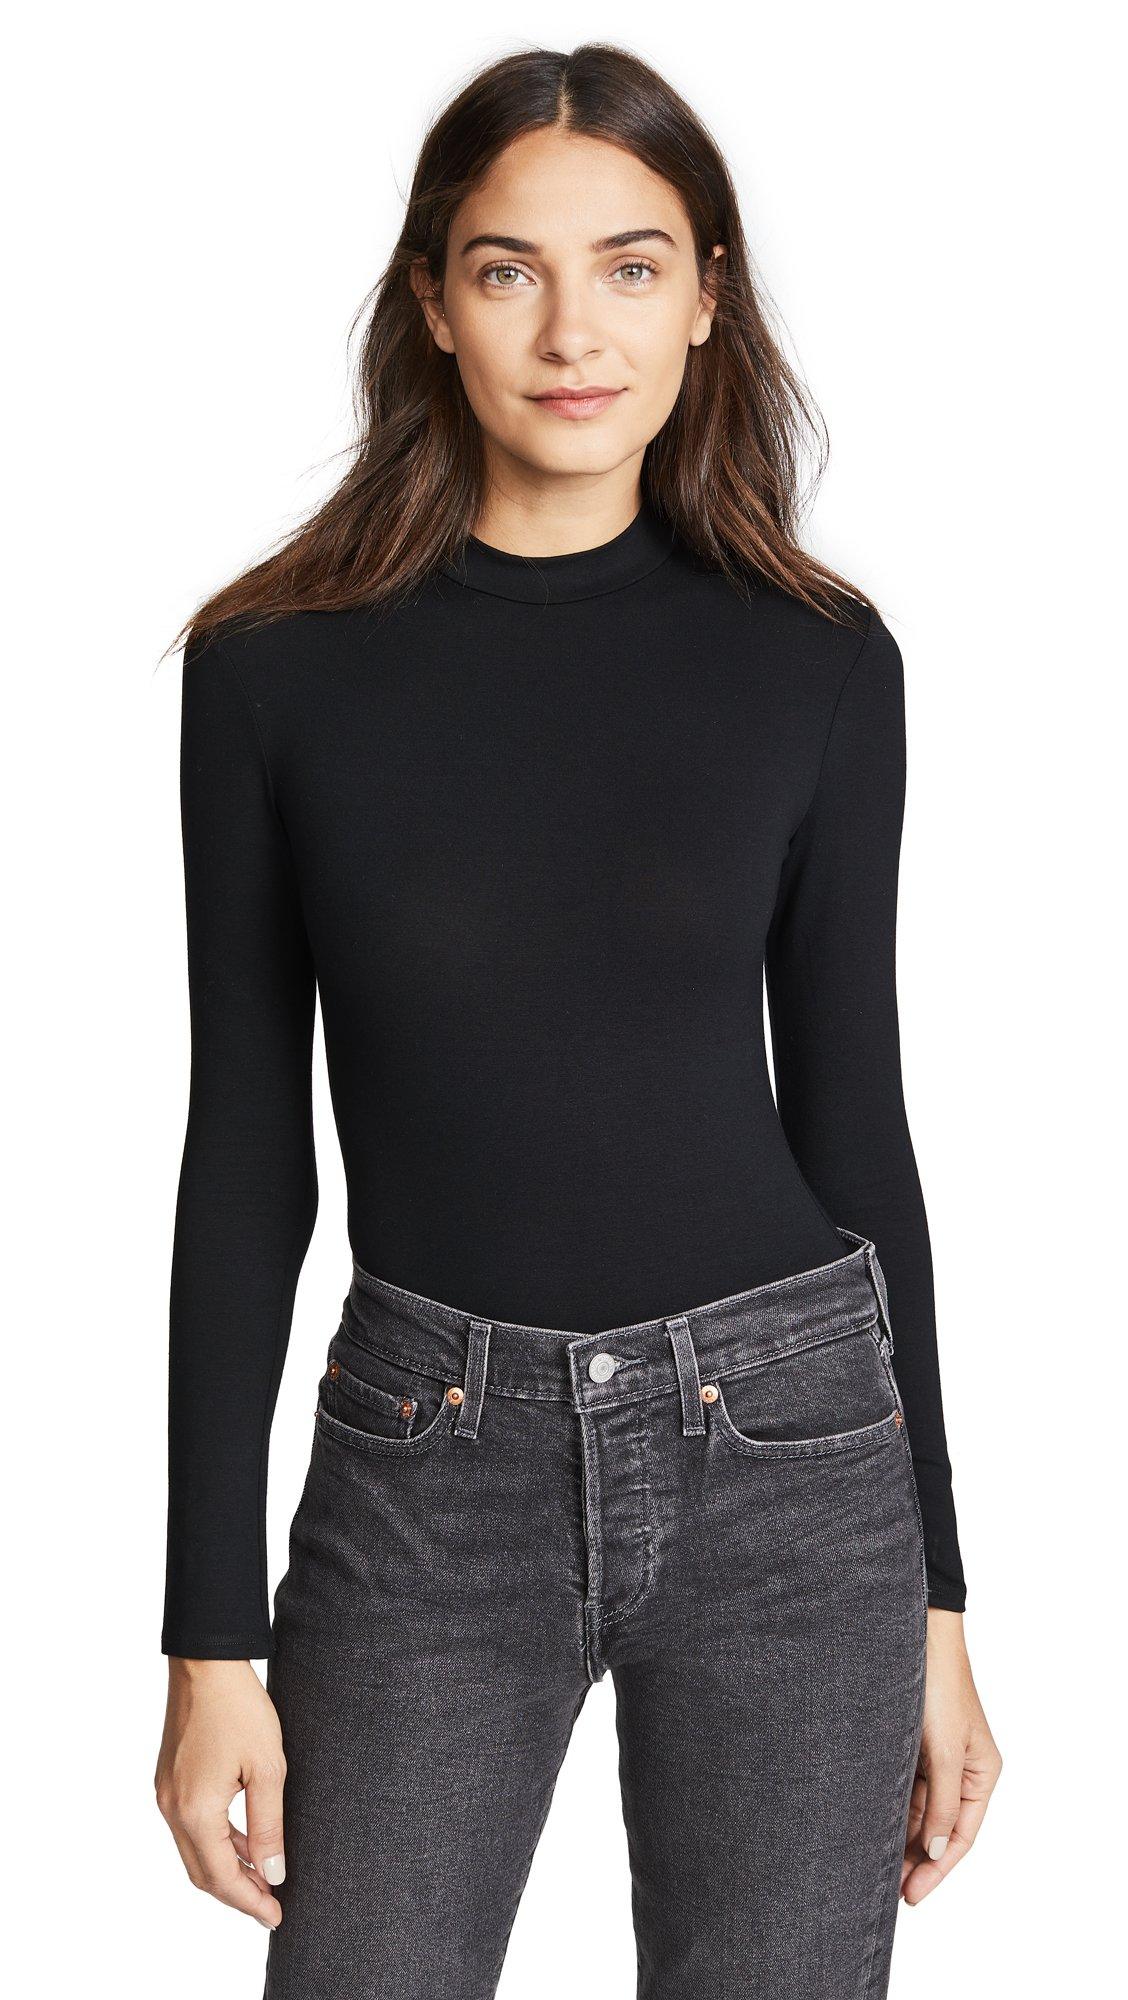 Only Hearts Women's So Fine Long Sleeve Bodysuit, Black, Medium